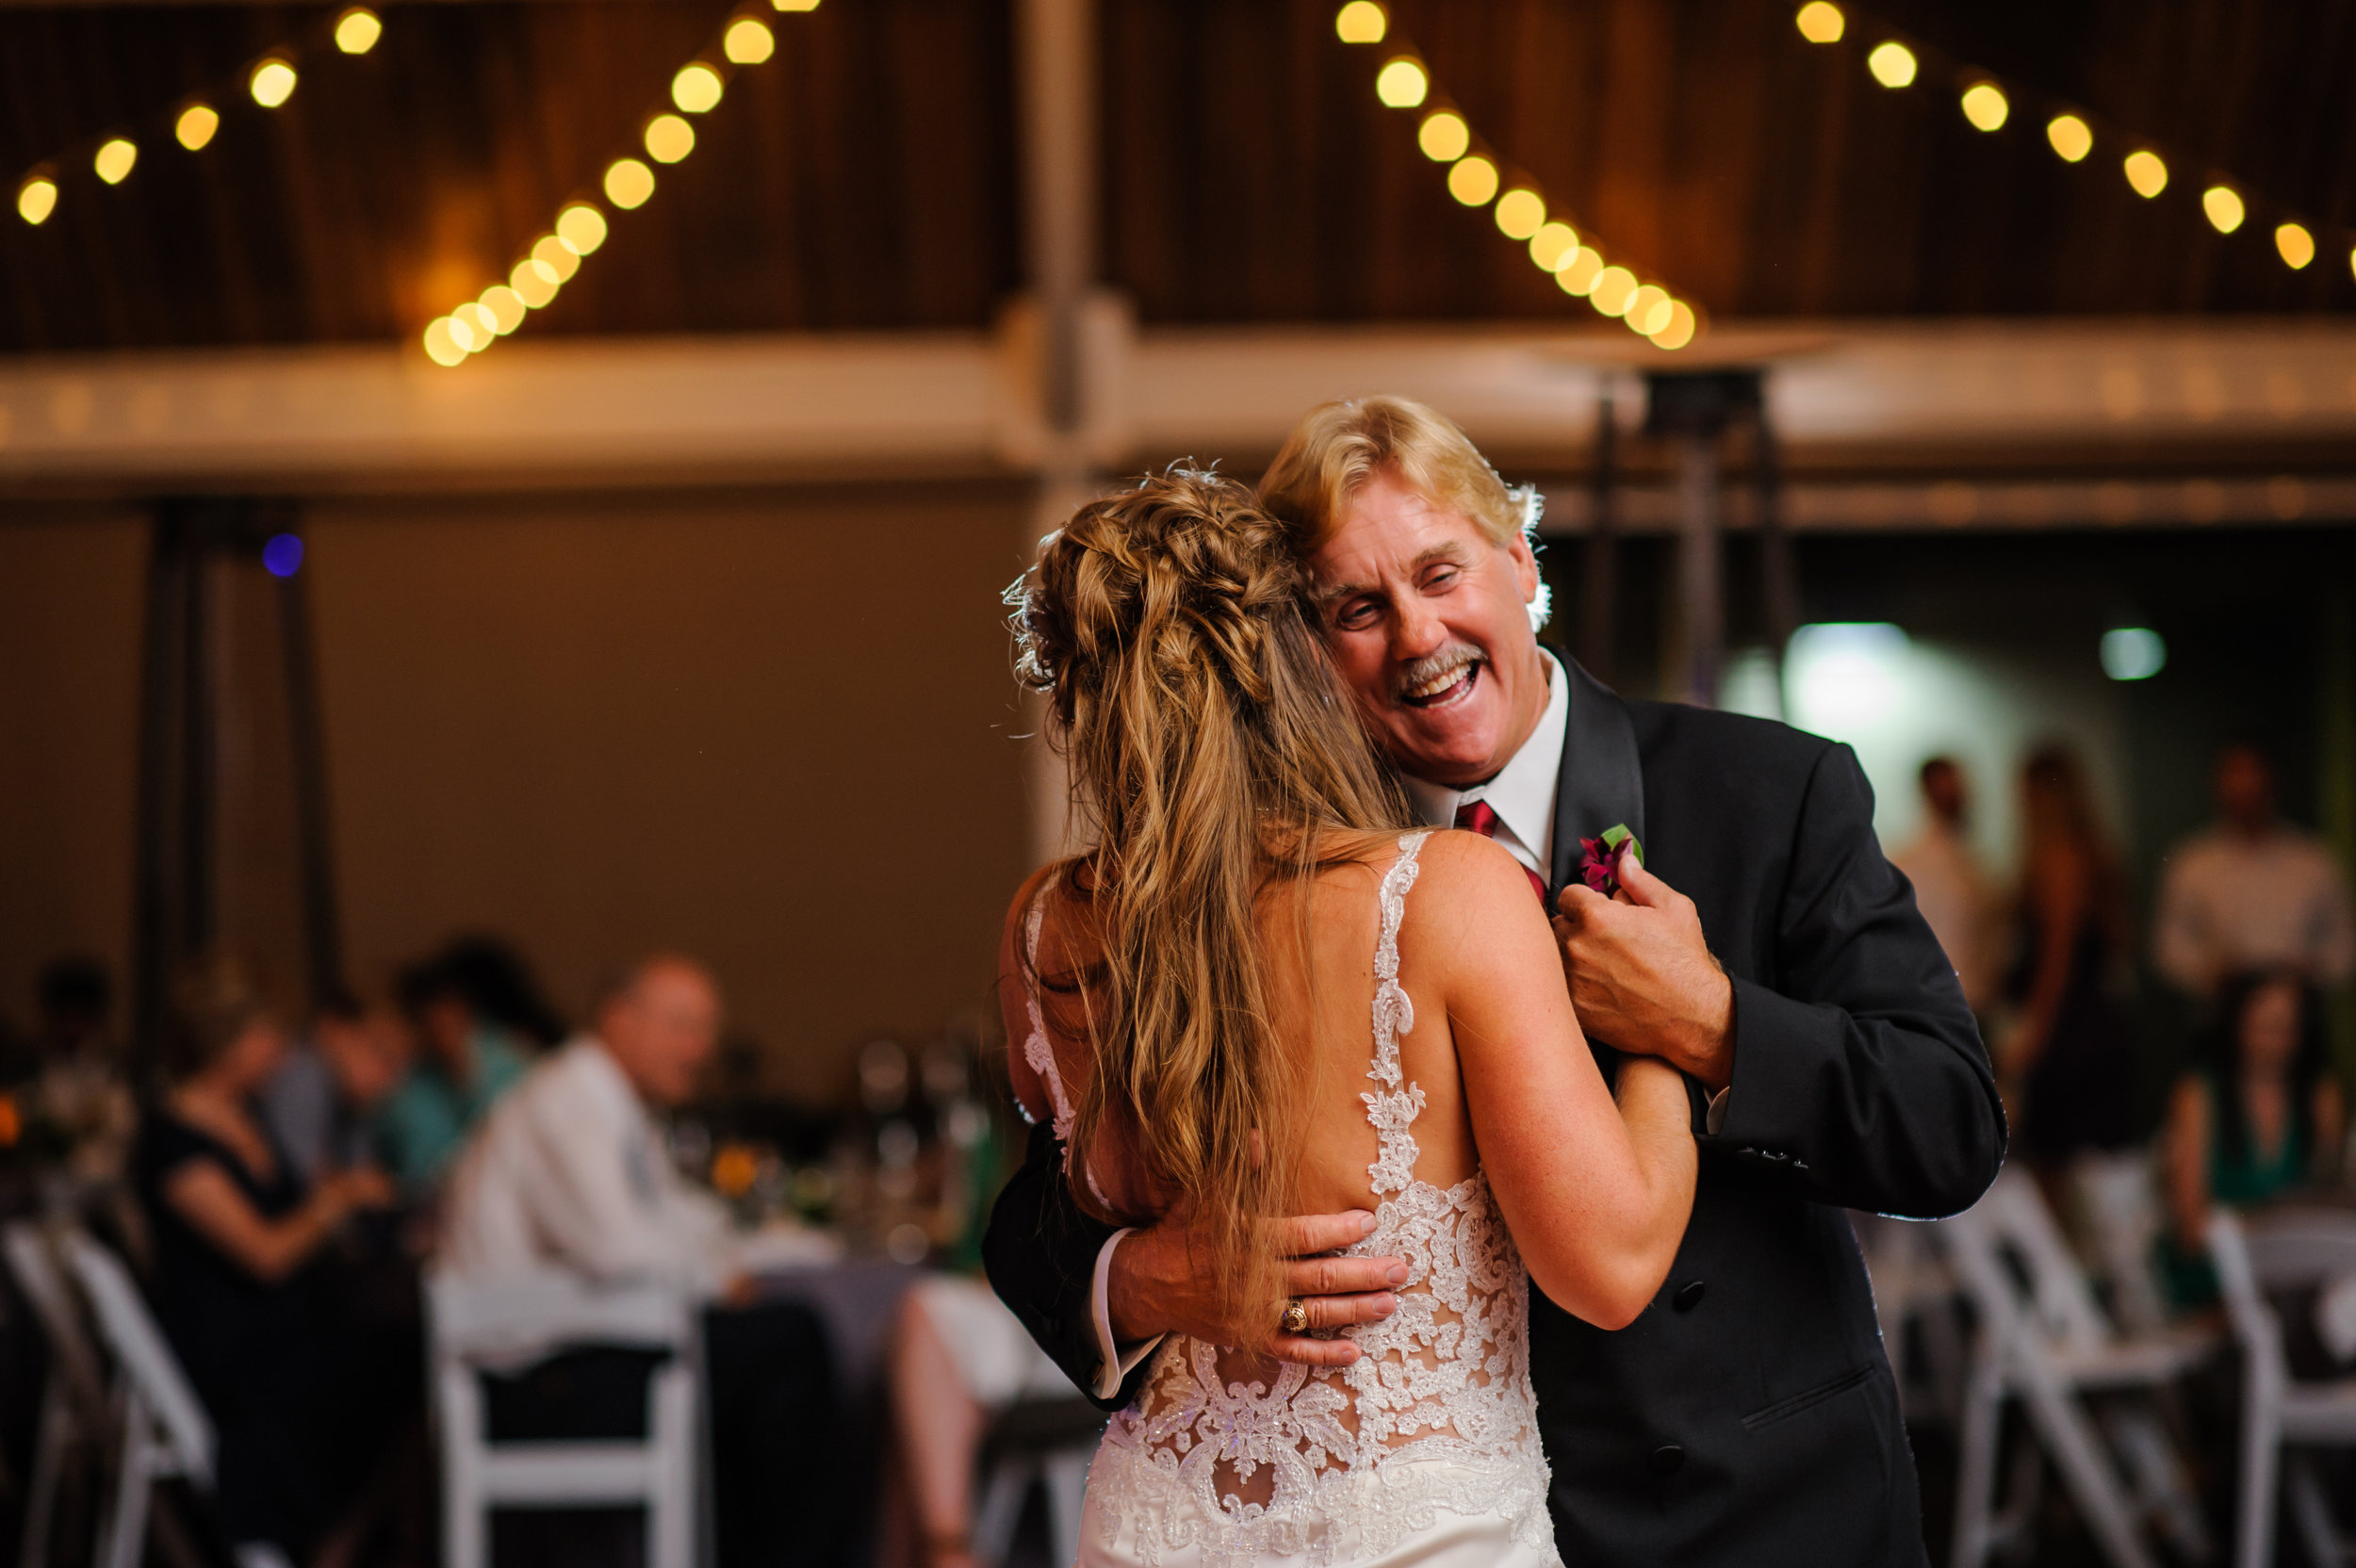 becca-jacob-043-tenaya-lodge-yosemite-wedding-photographer-katherine-nicole-photography.JPG